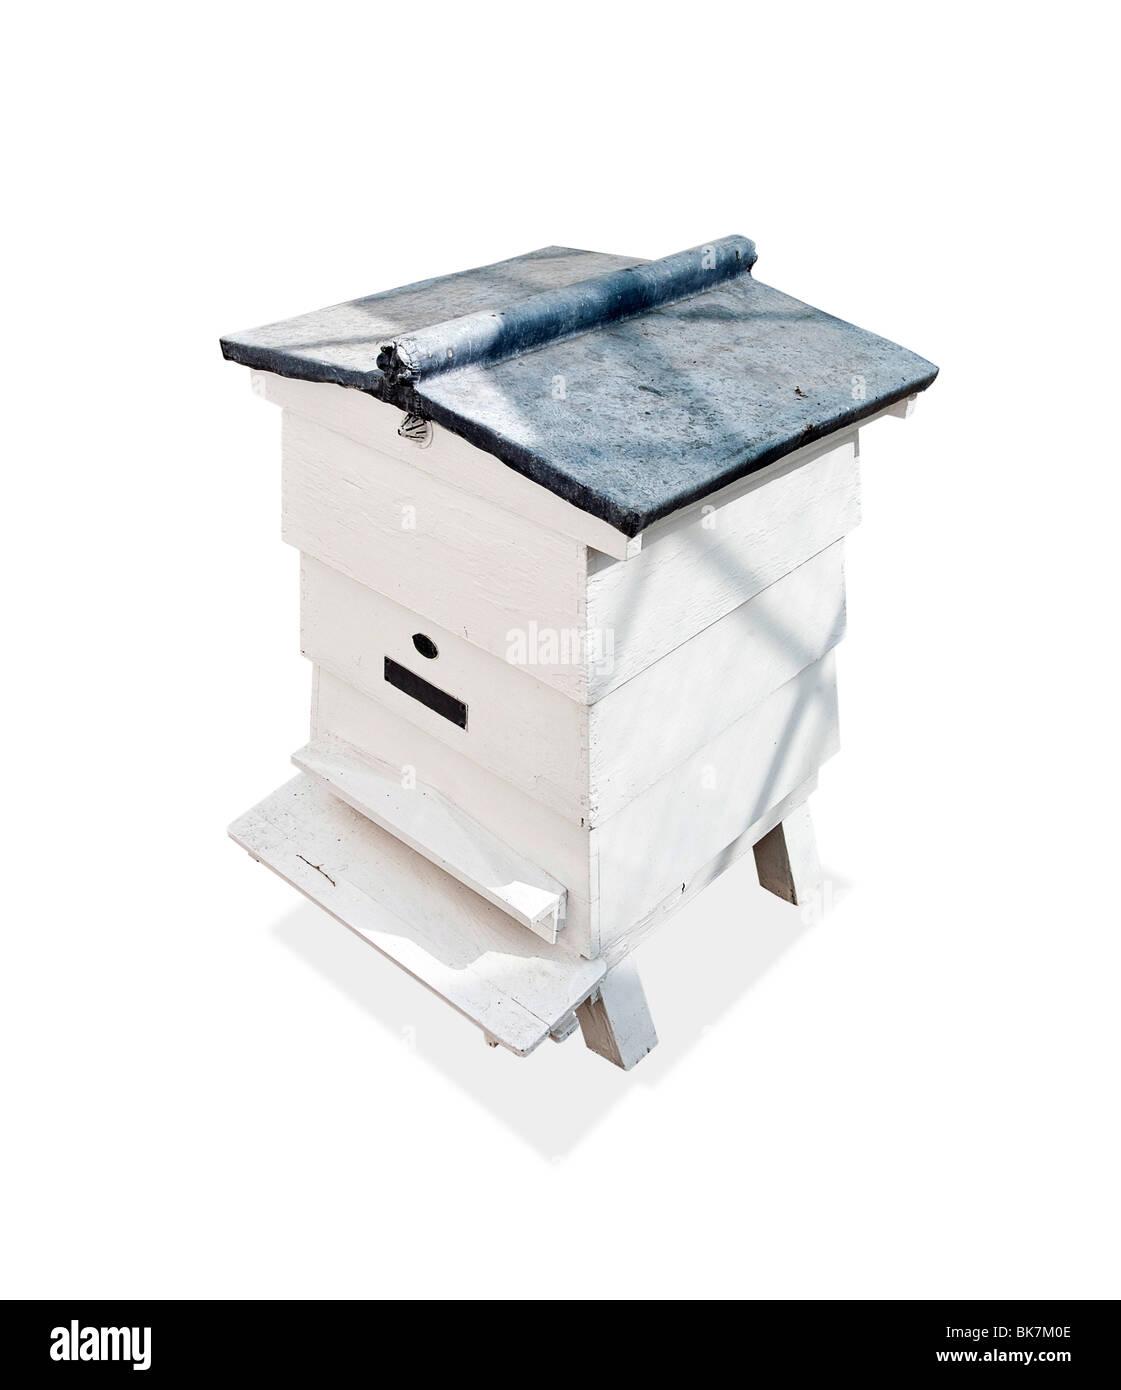 Bee hive - Stock Image